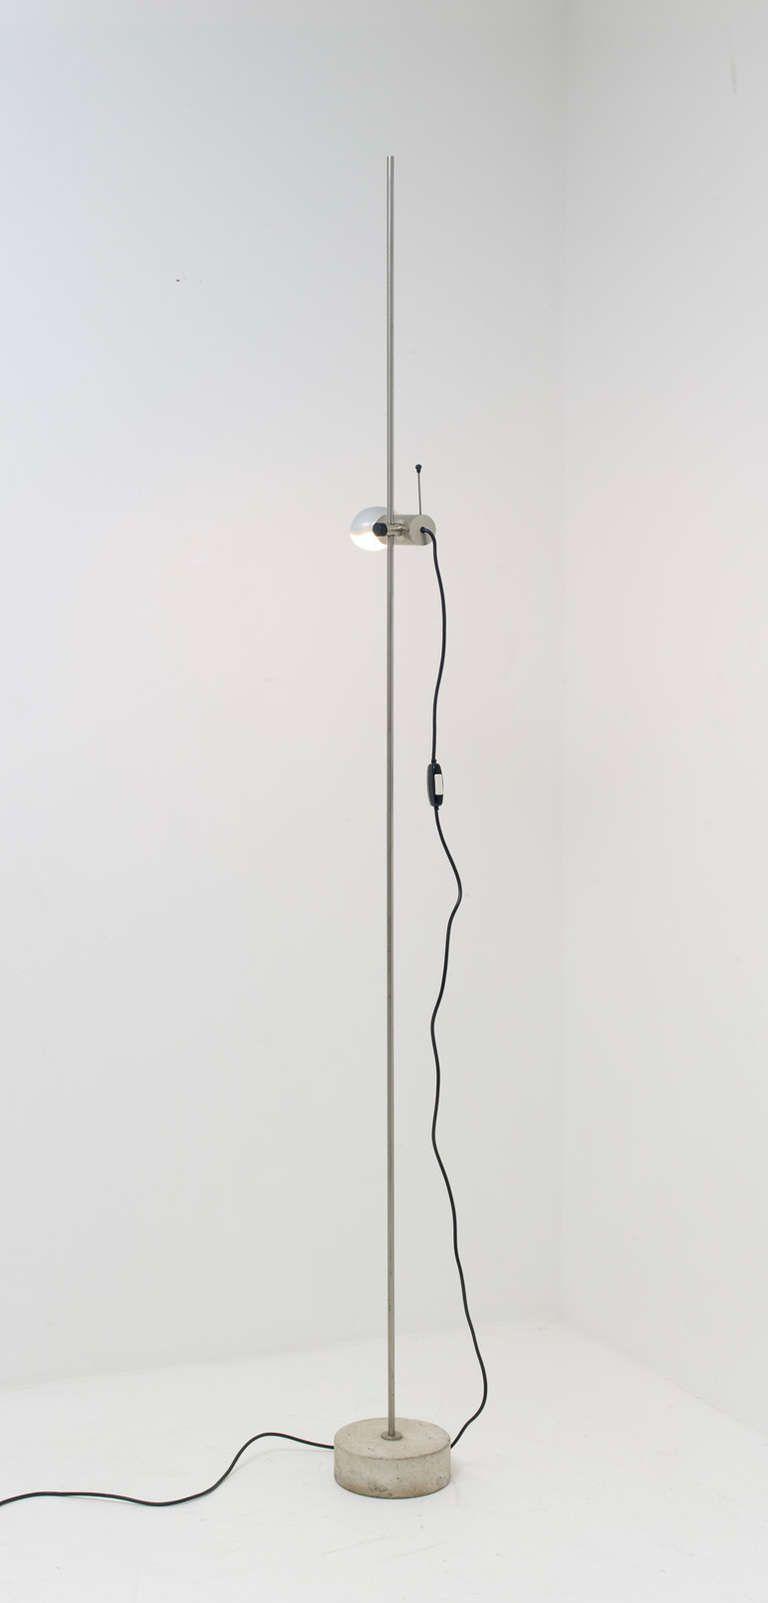 Tito Agnoli Agnoli 387 For Oluce Lamp Design Creative Lighting Bookshelf Lighting